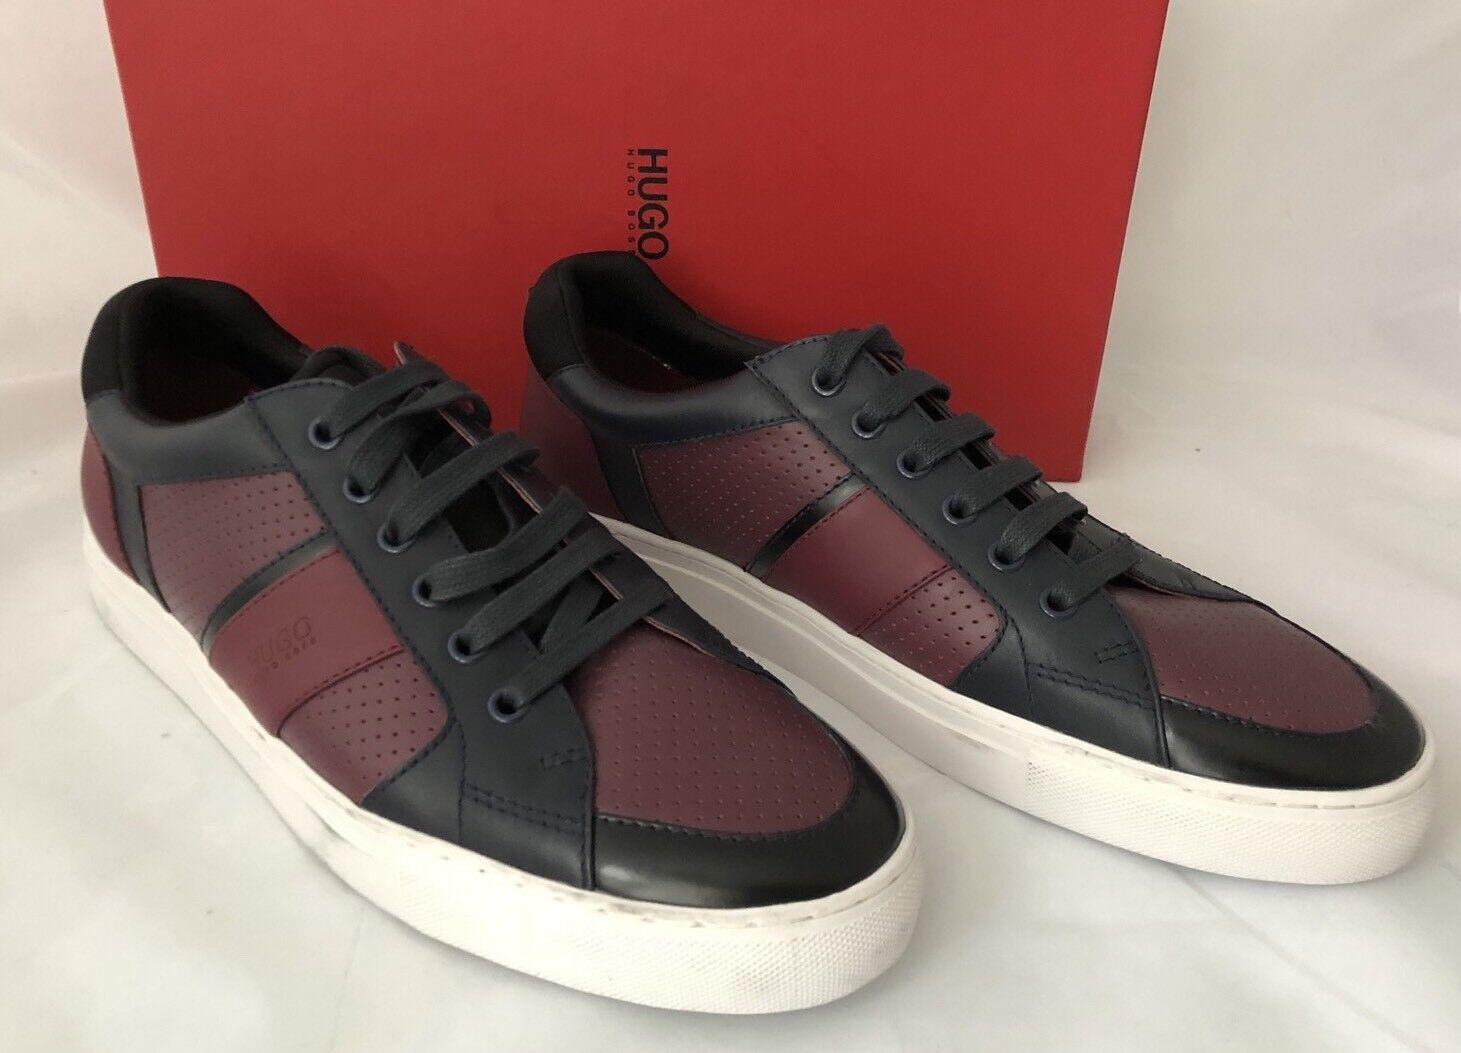 NIB $275 Boss Hugo Boss Fuster Men's Sneakers Dark Red 11 US